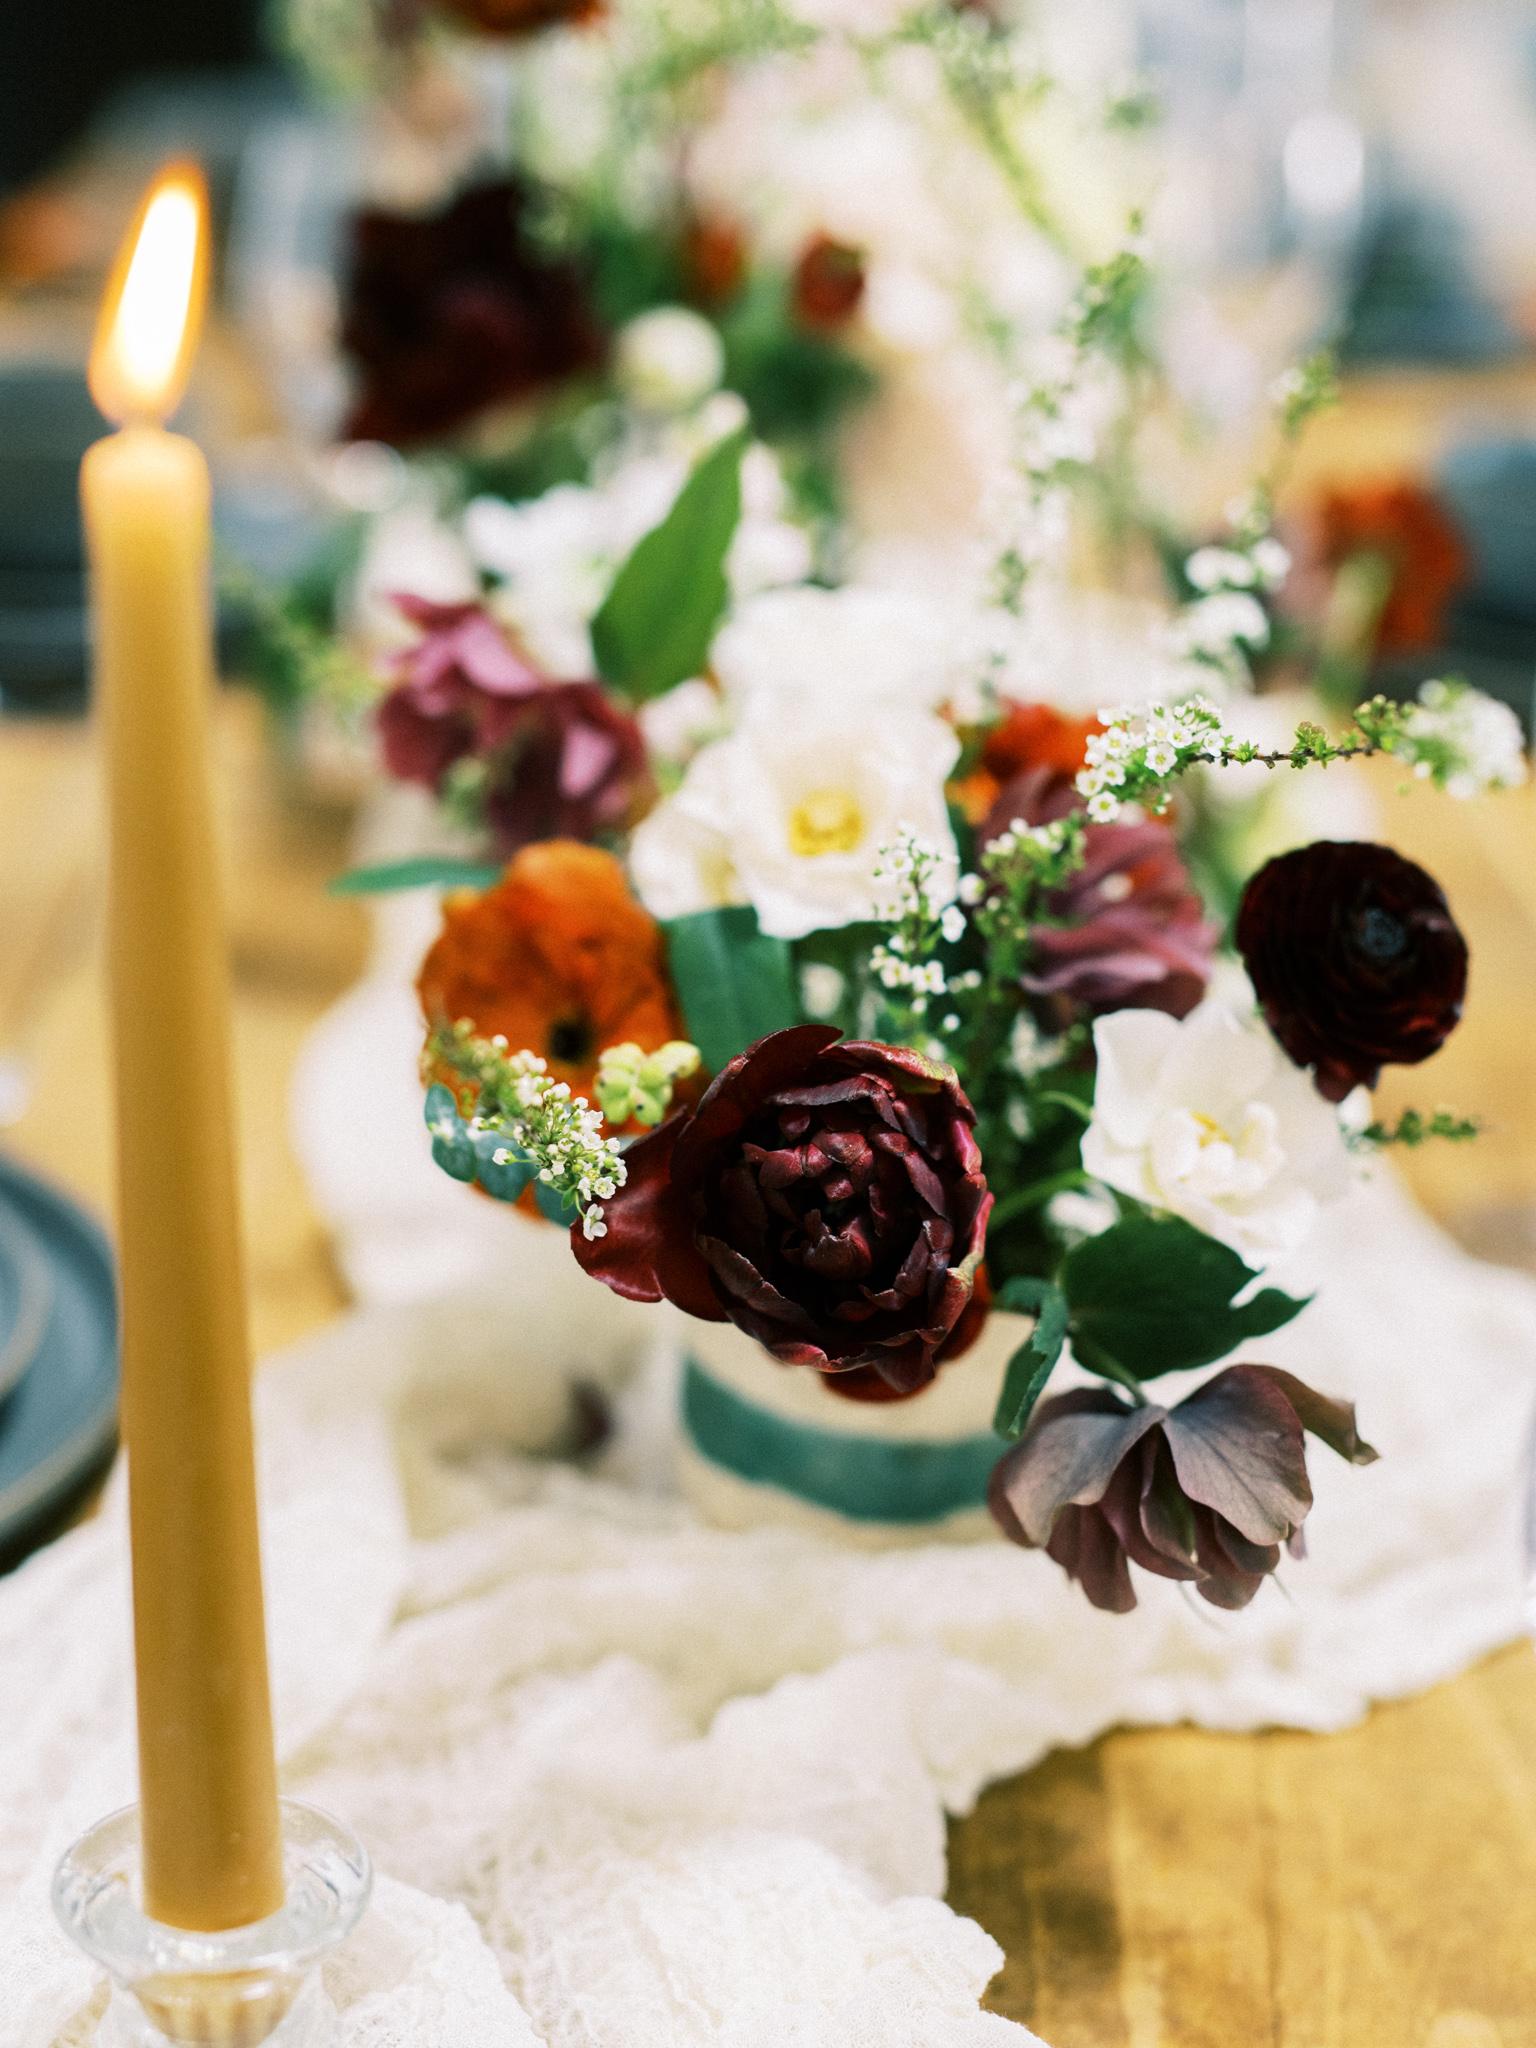 Cultivate Goods Floral Workshop - The Doyle - Kristen Krehbiel - Kristen Kay Photography-31.jpg